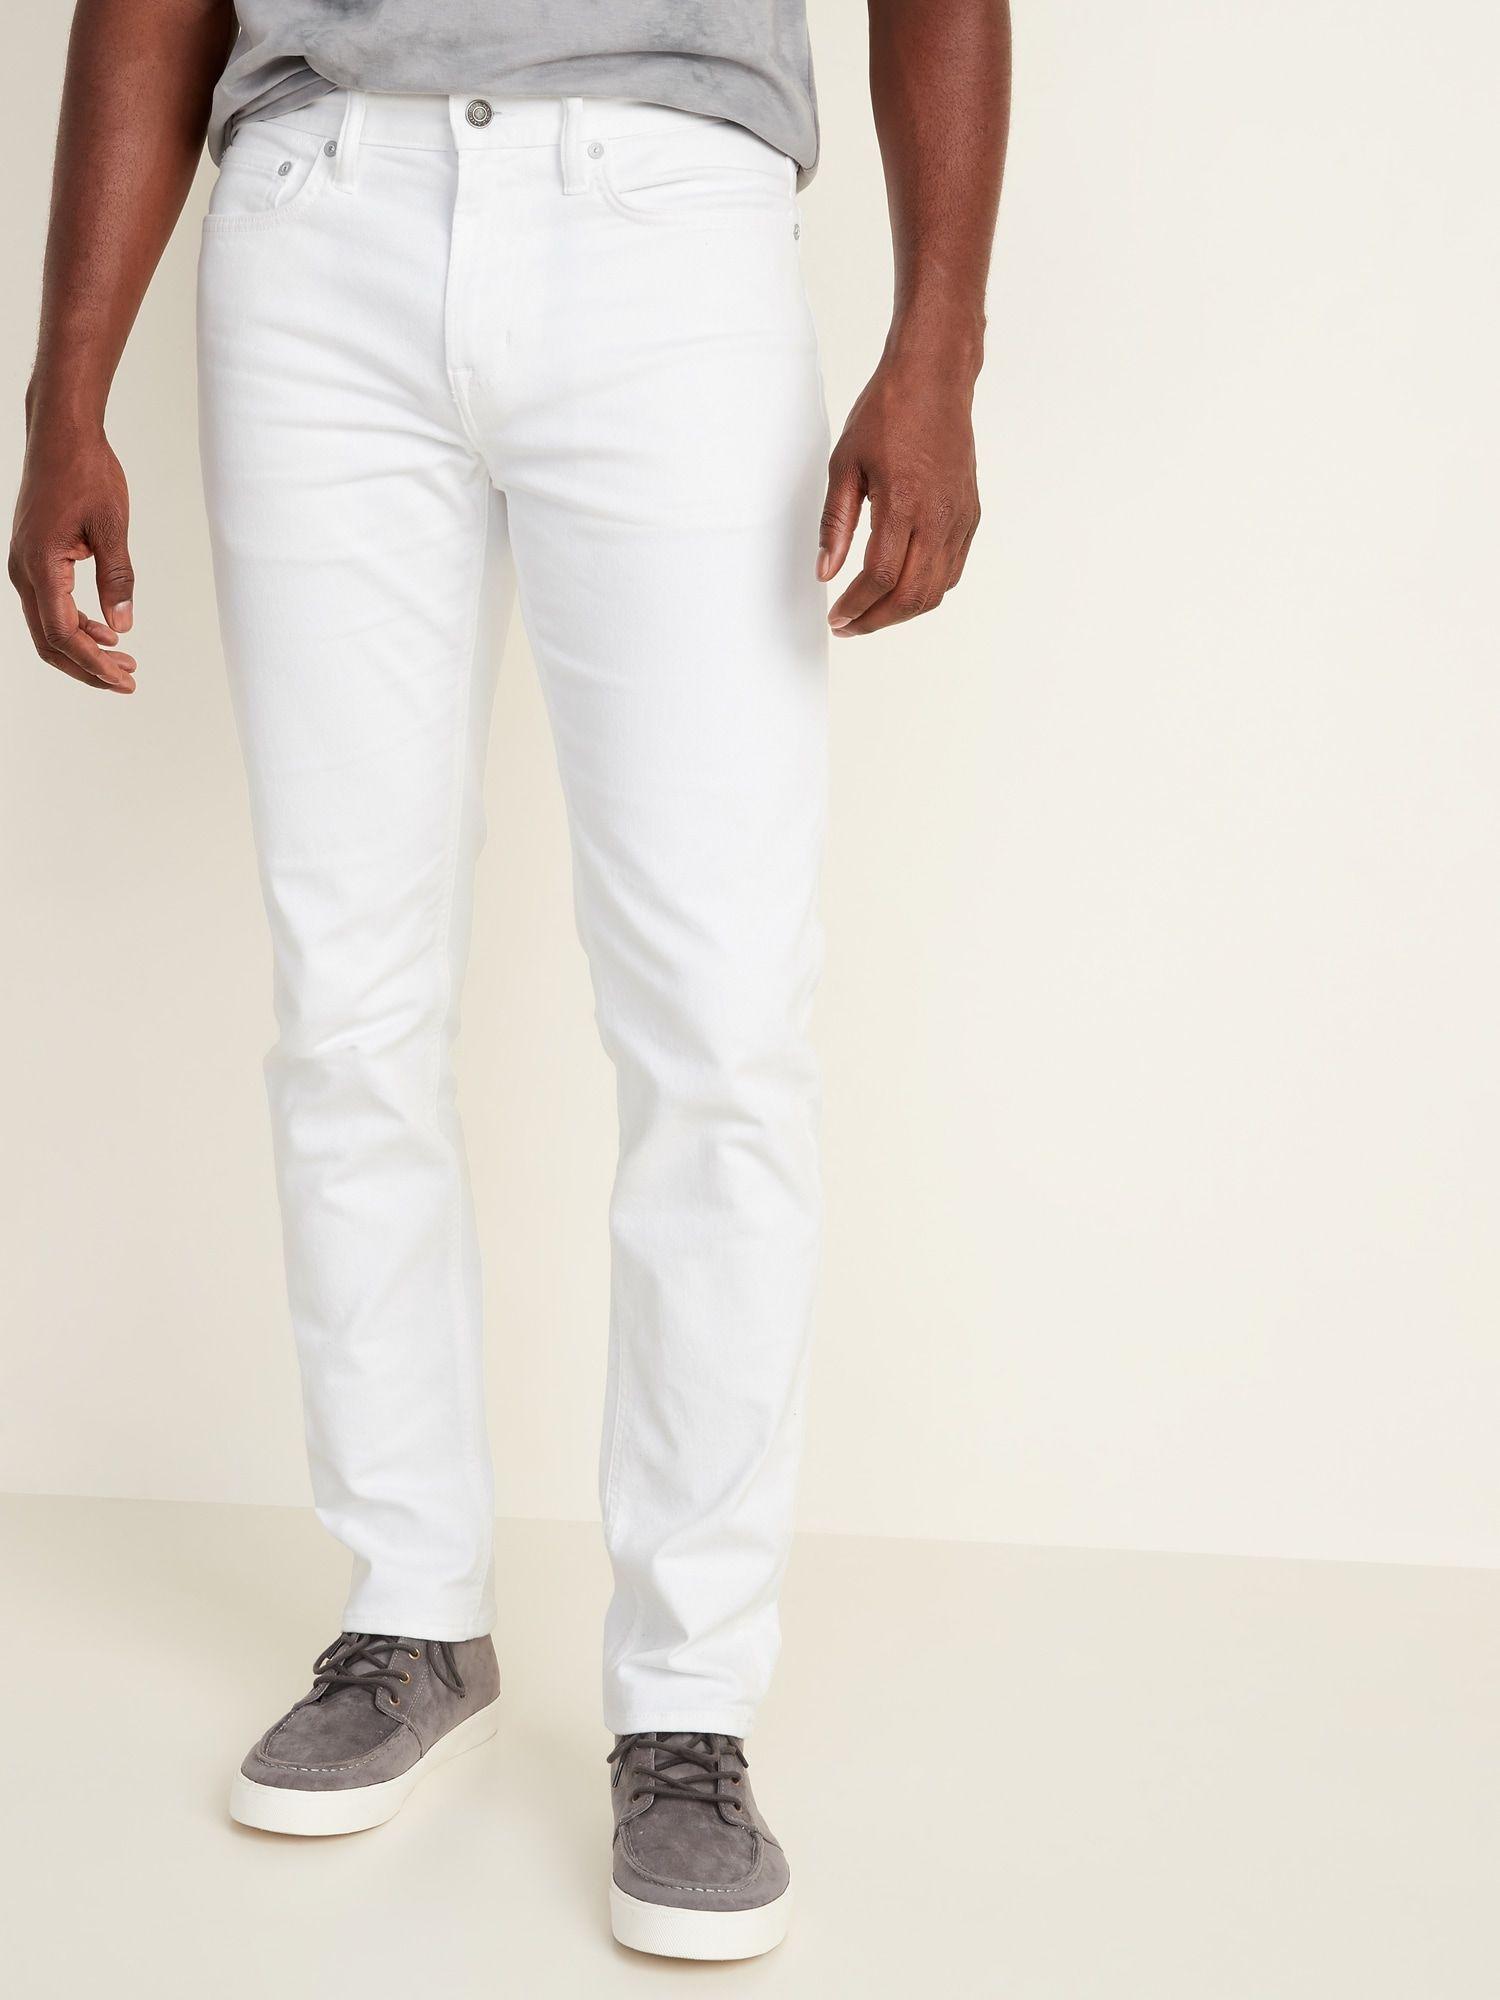 Old Navy Men S Slim Built In Flex White Jeans White Lilies Size 32w White Jeans Men Mens Jeans Fall Outfits Men [ 2000 x 1500 Pixel ]